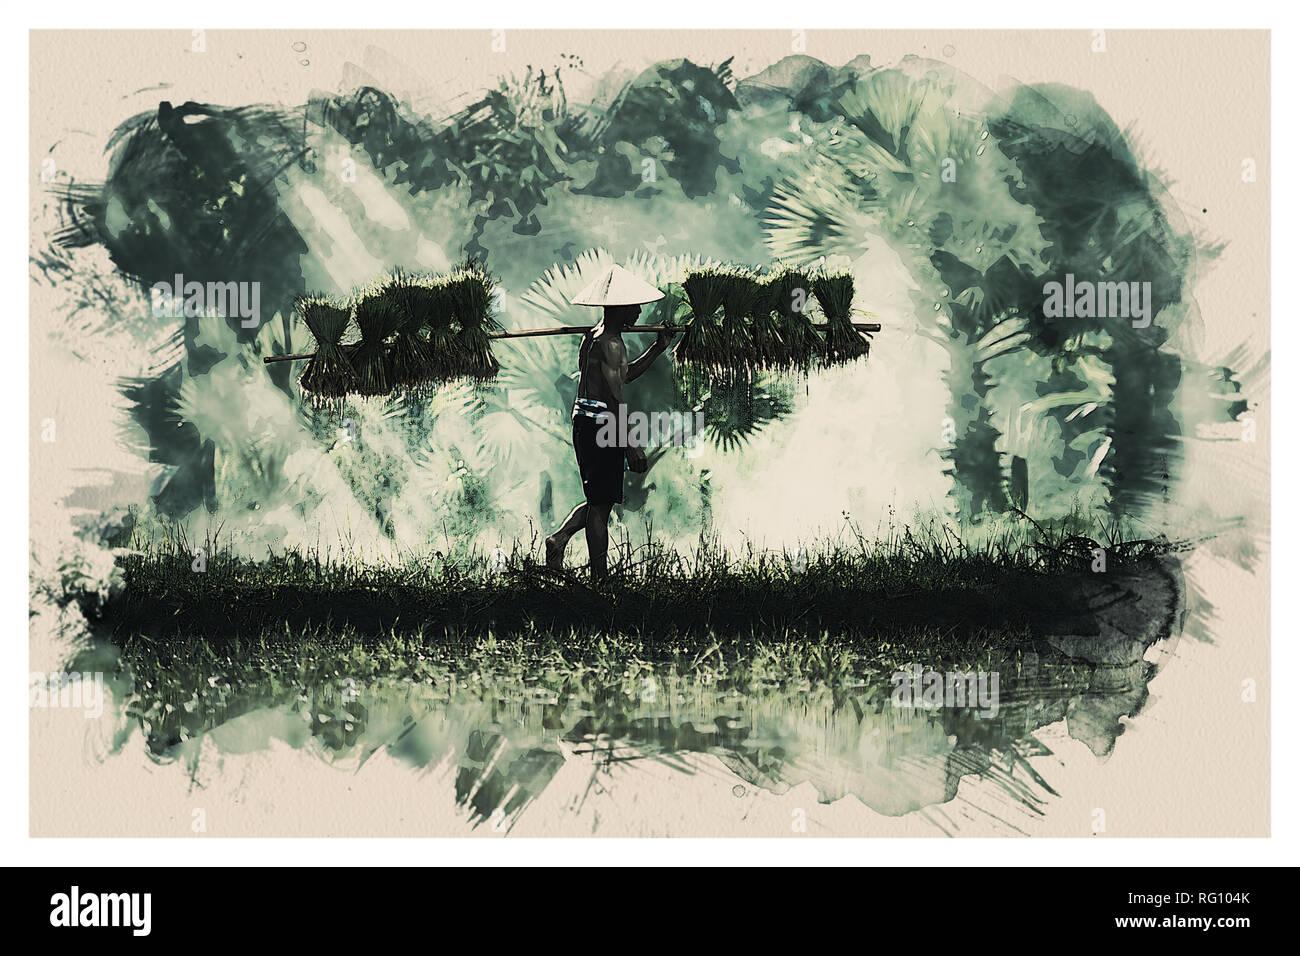 Wildlife Series - Sumatra Rce Farmer.jpg - RG104K 1RG104K - Stock Image